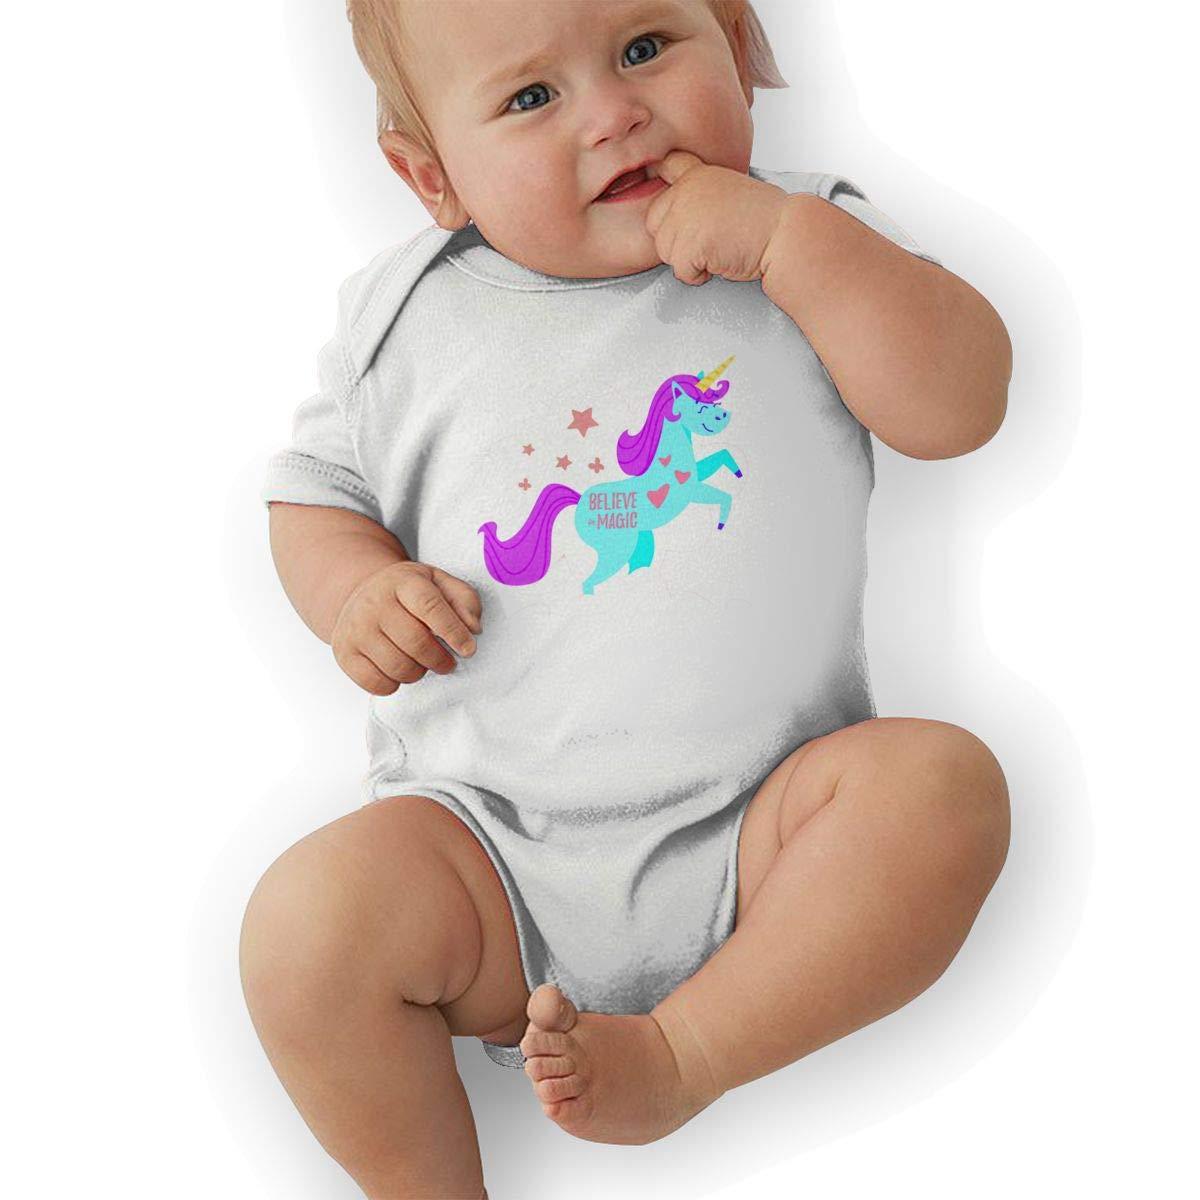 Happy Unicorn Newborn Baby Short Sleeve Romper Infant Summer Clothing